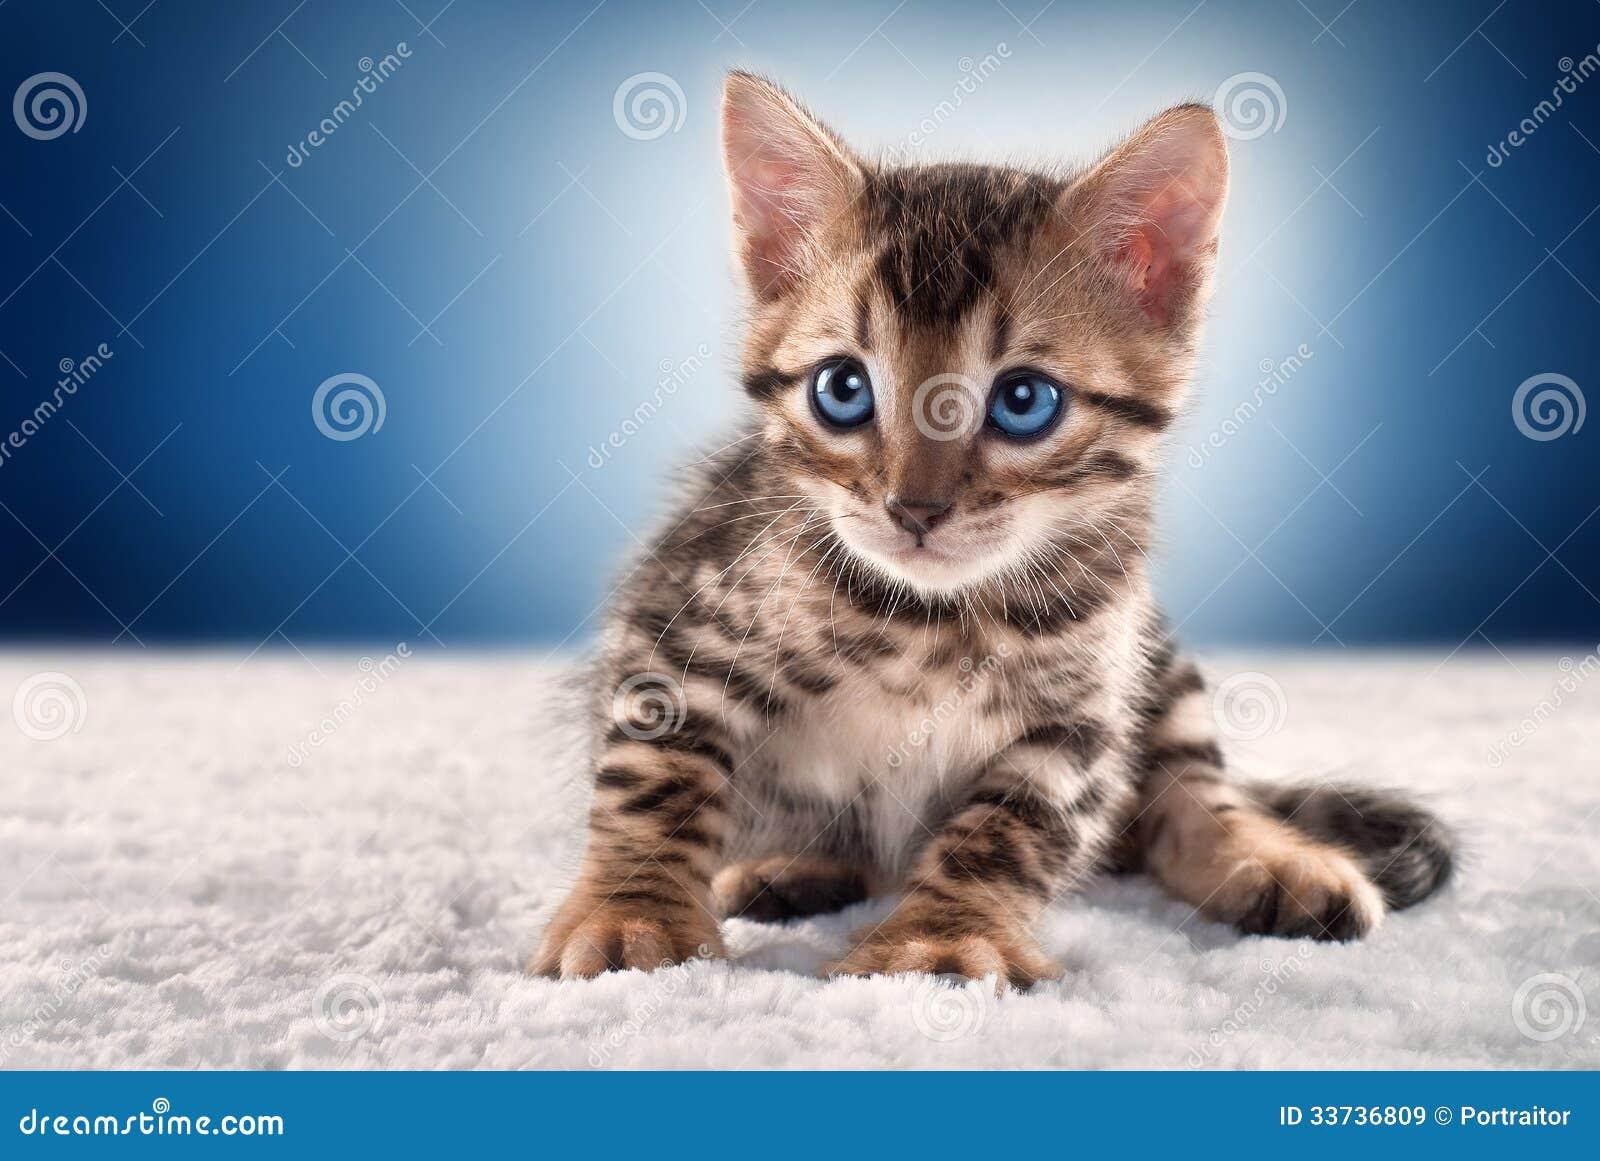 Bengal kattunge på blå bakgrund